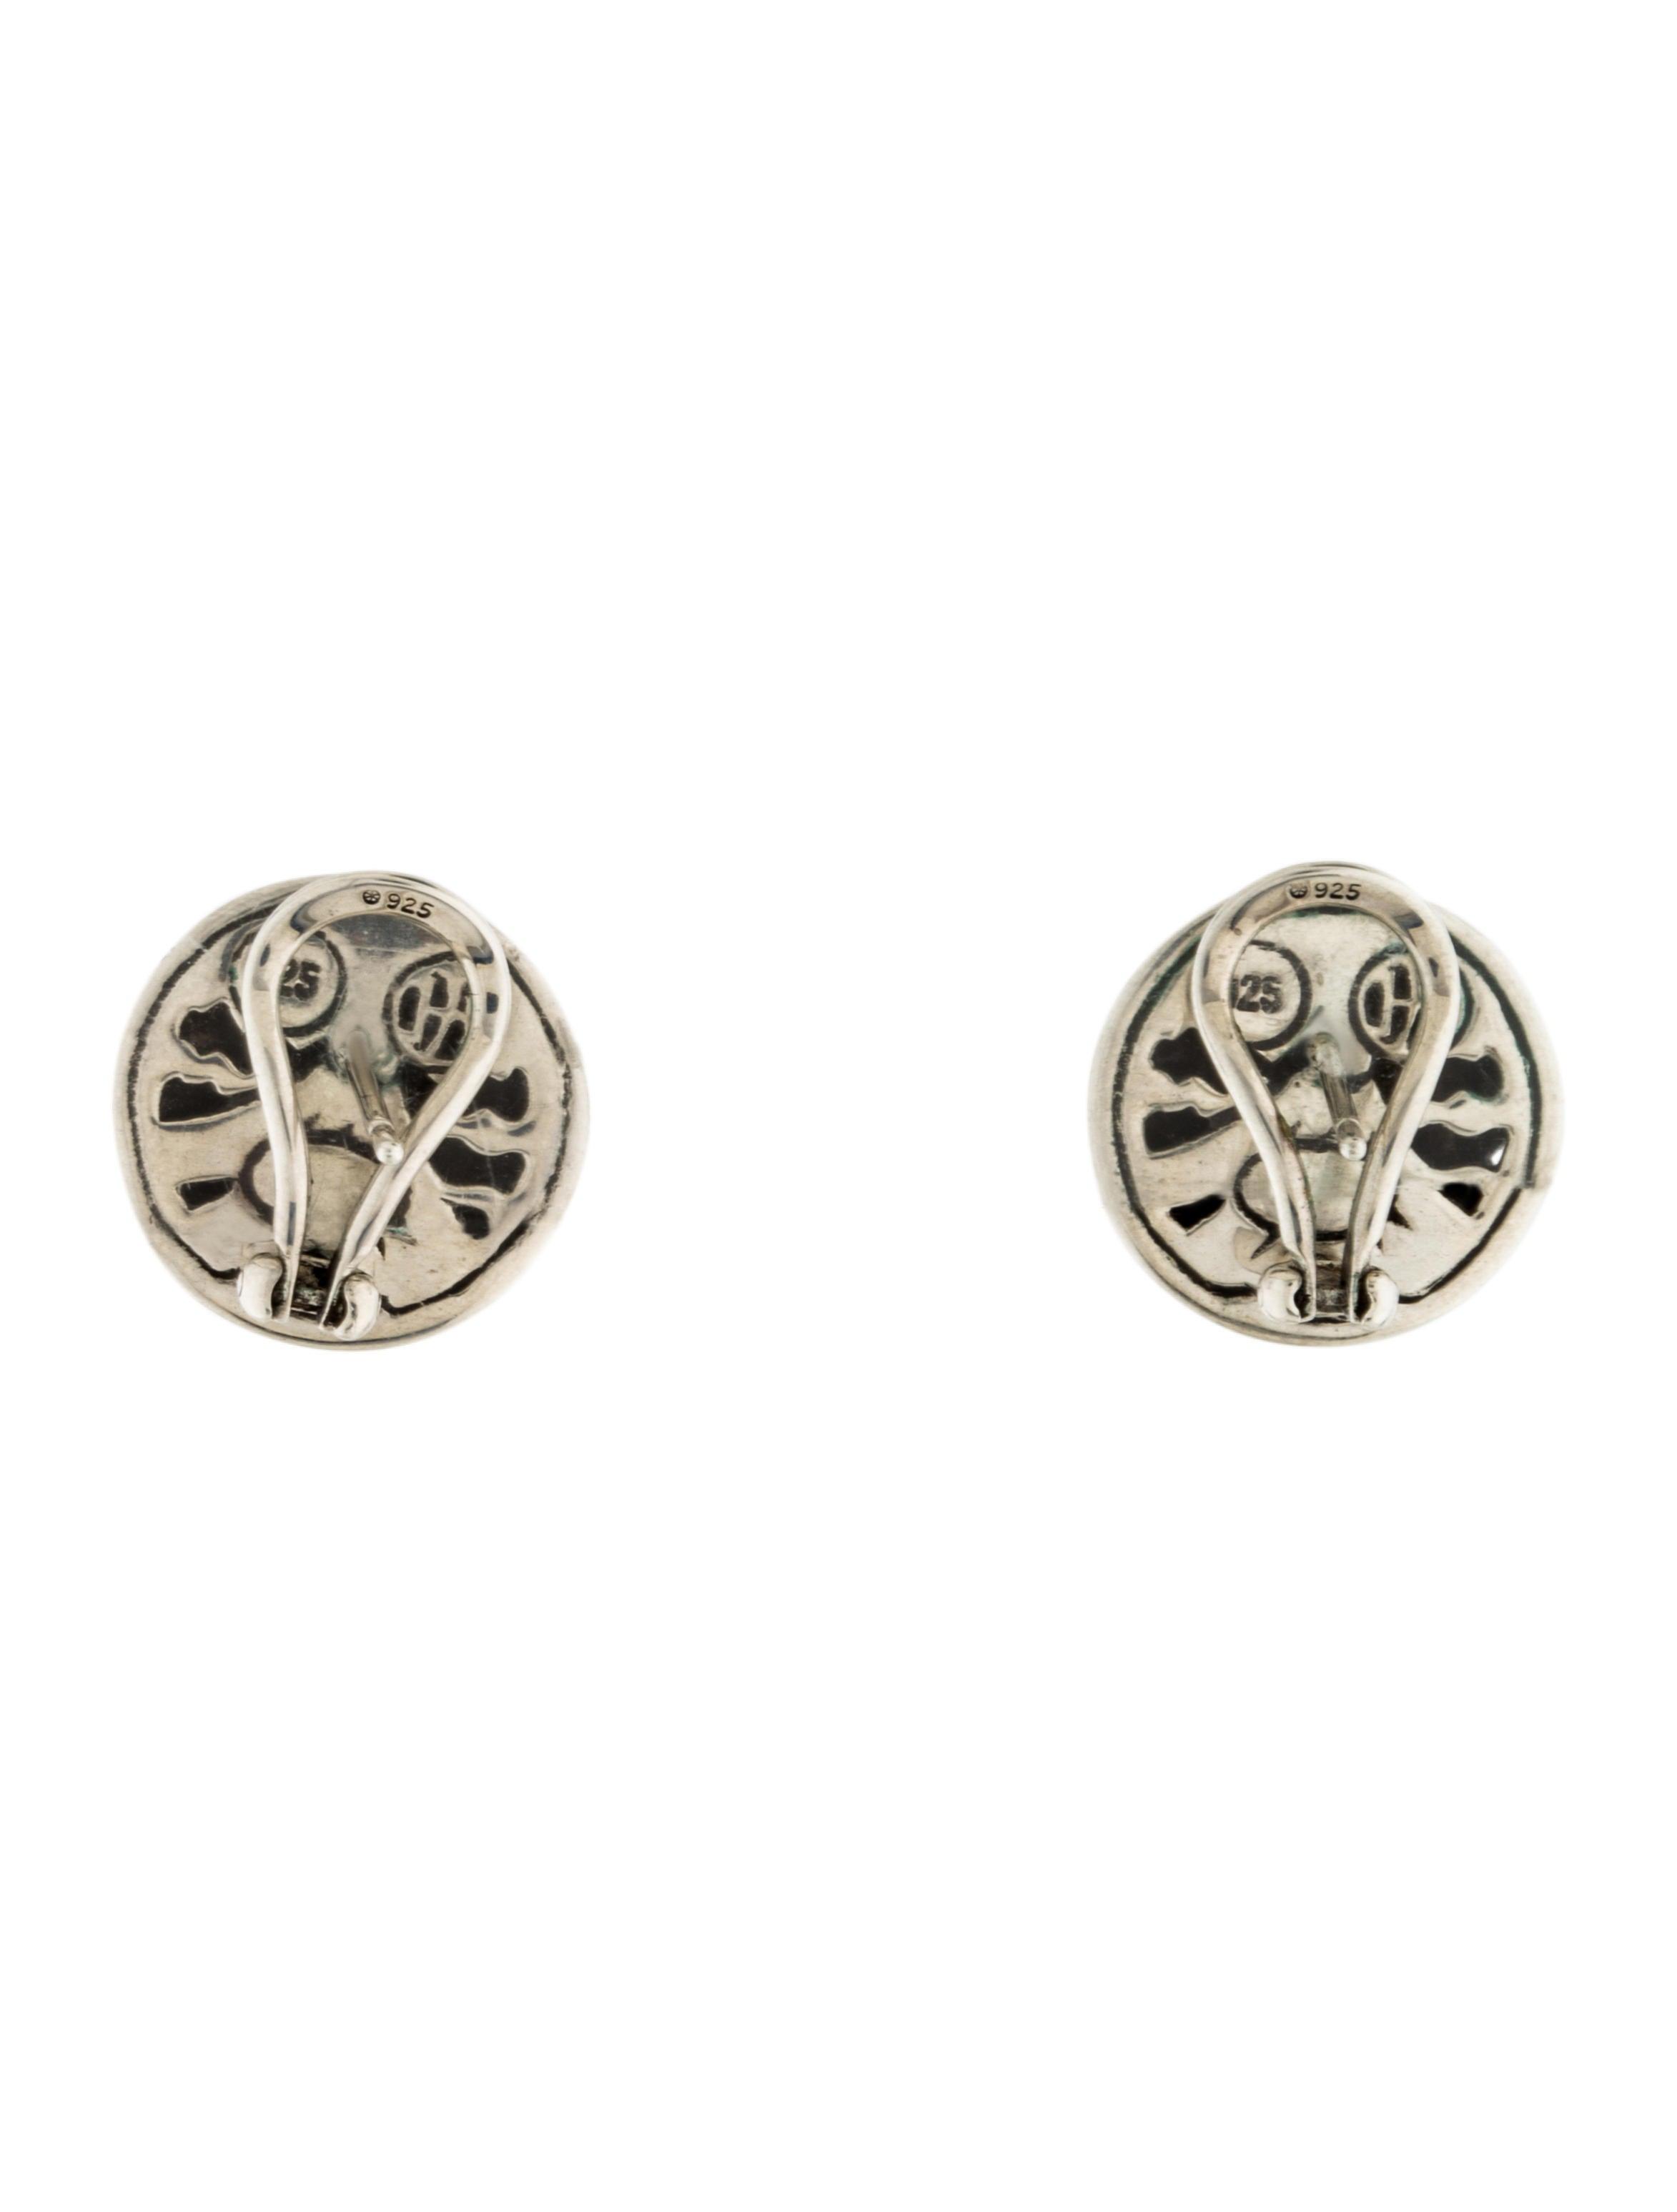 John hardy palu earrings earrings jha26606 the realreal for John hardy jewelry earrings